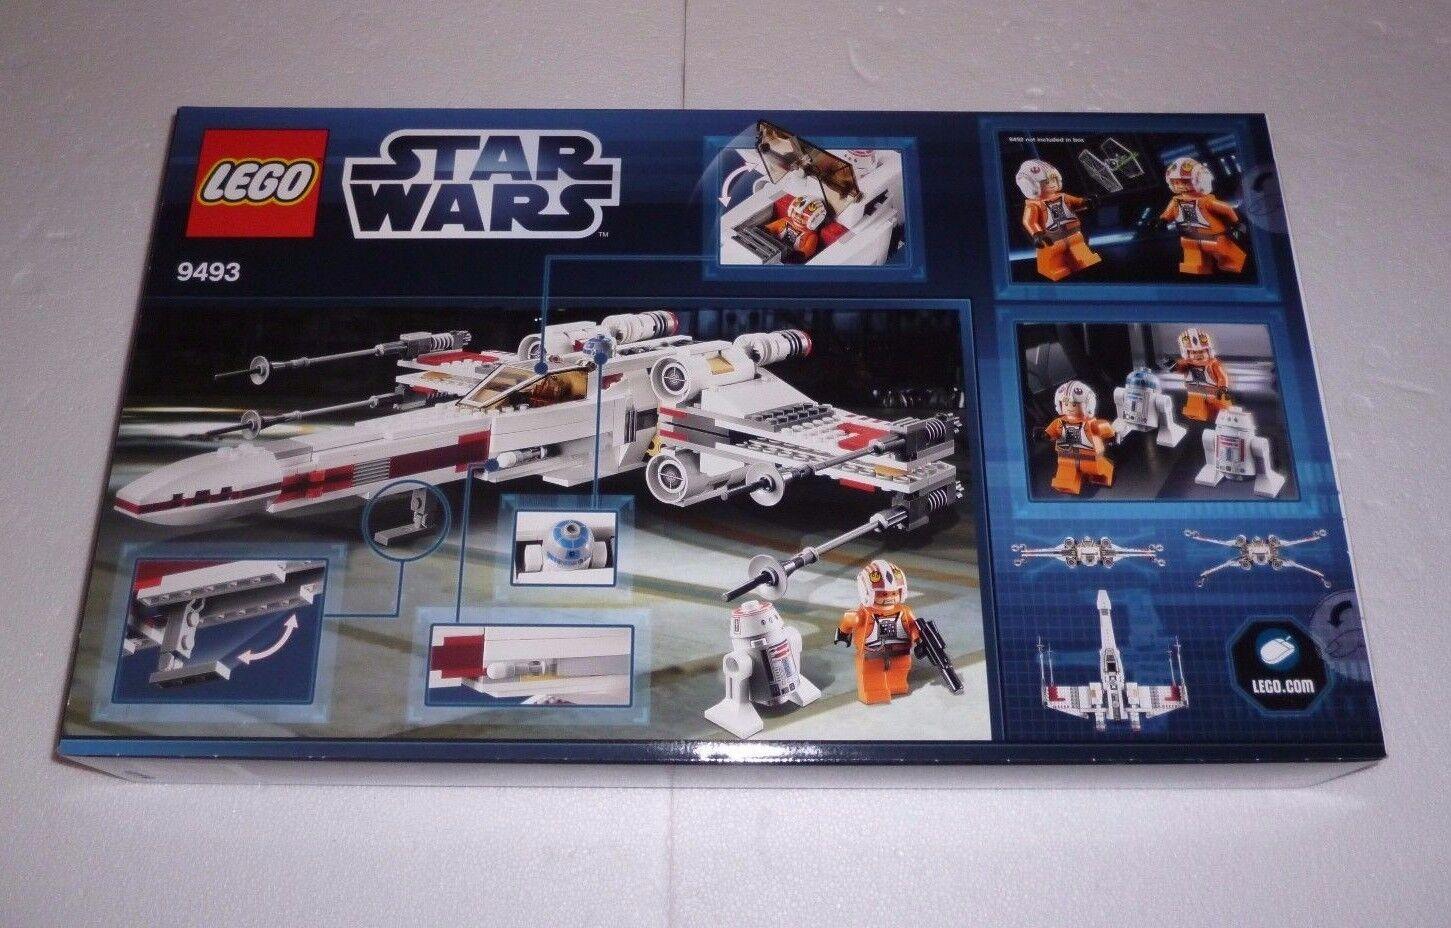 Lego Star Wars X-Wing Starfighter (9493) NEUF/NEW NEUF NEUF NEUF dans sa boîte | Matière Choisie  65c02e